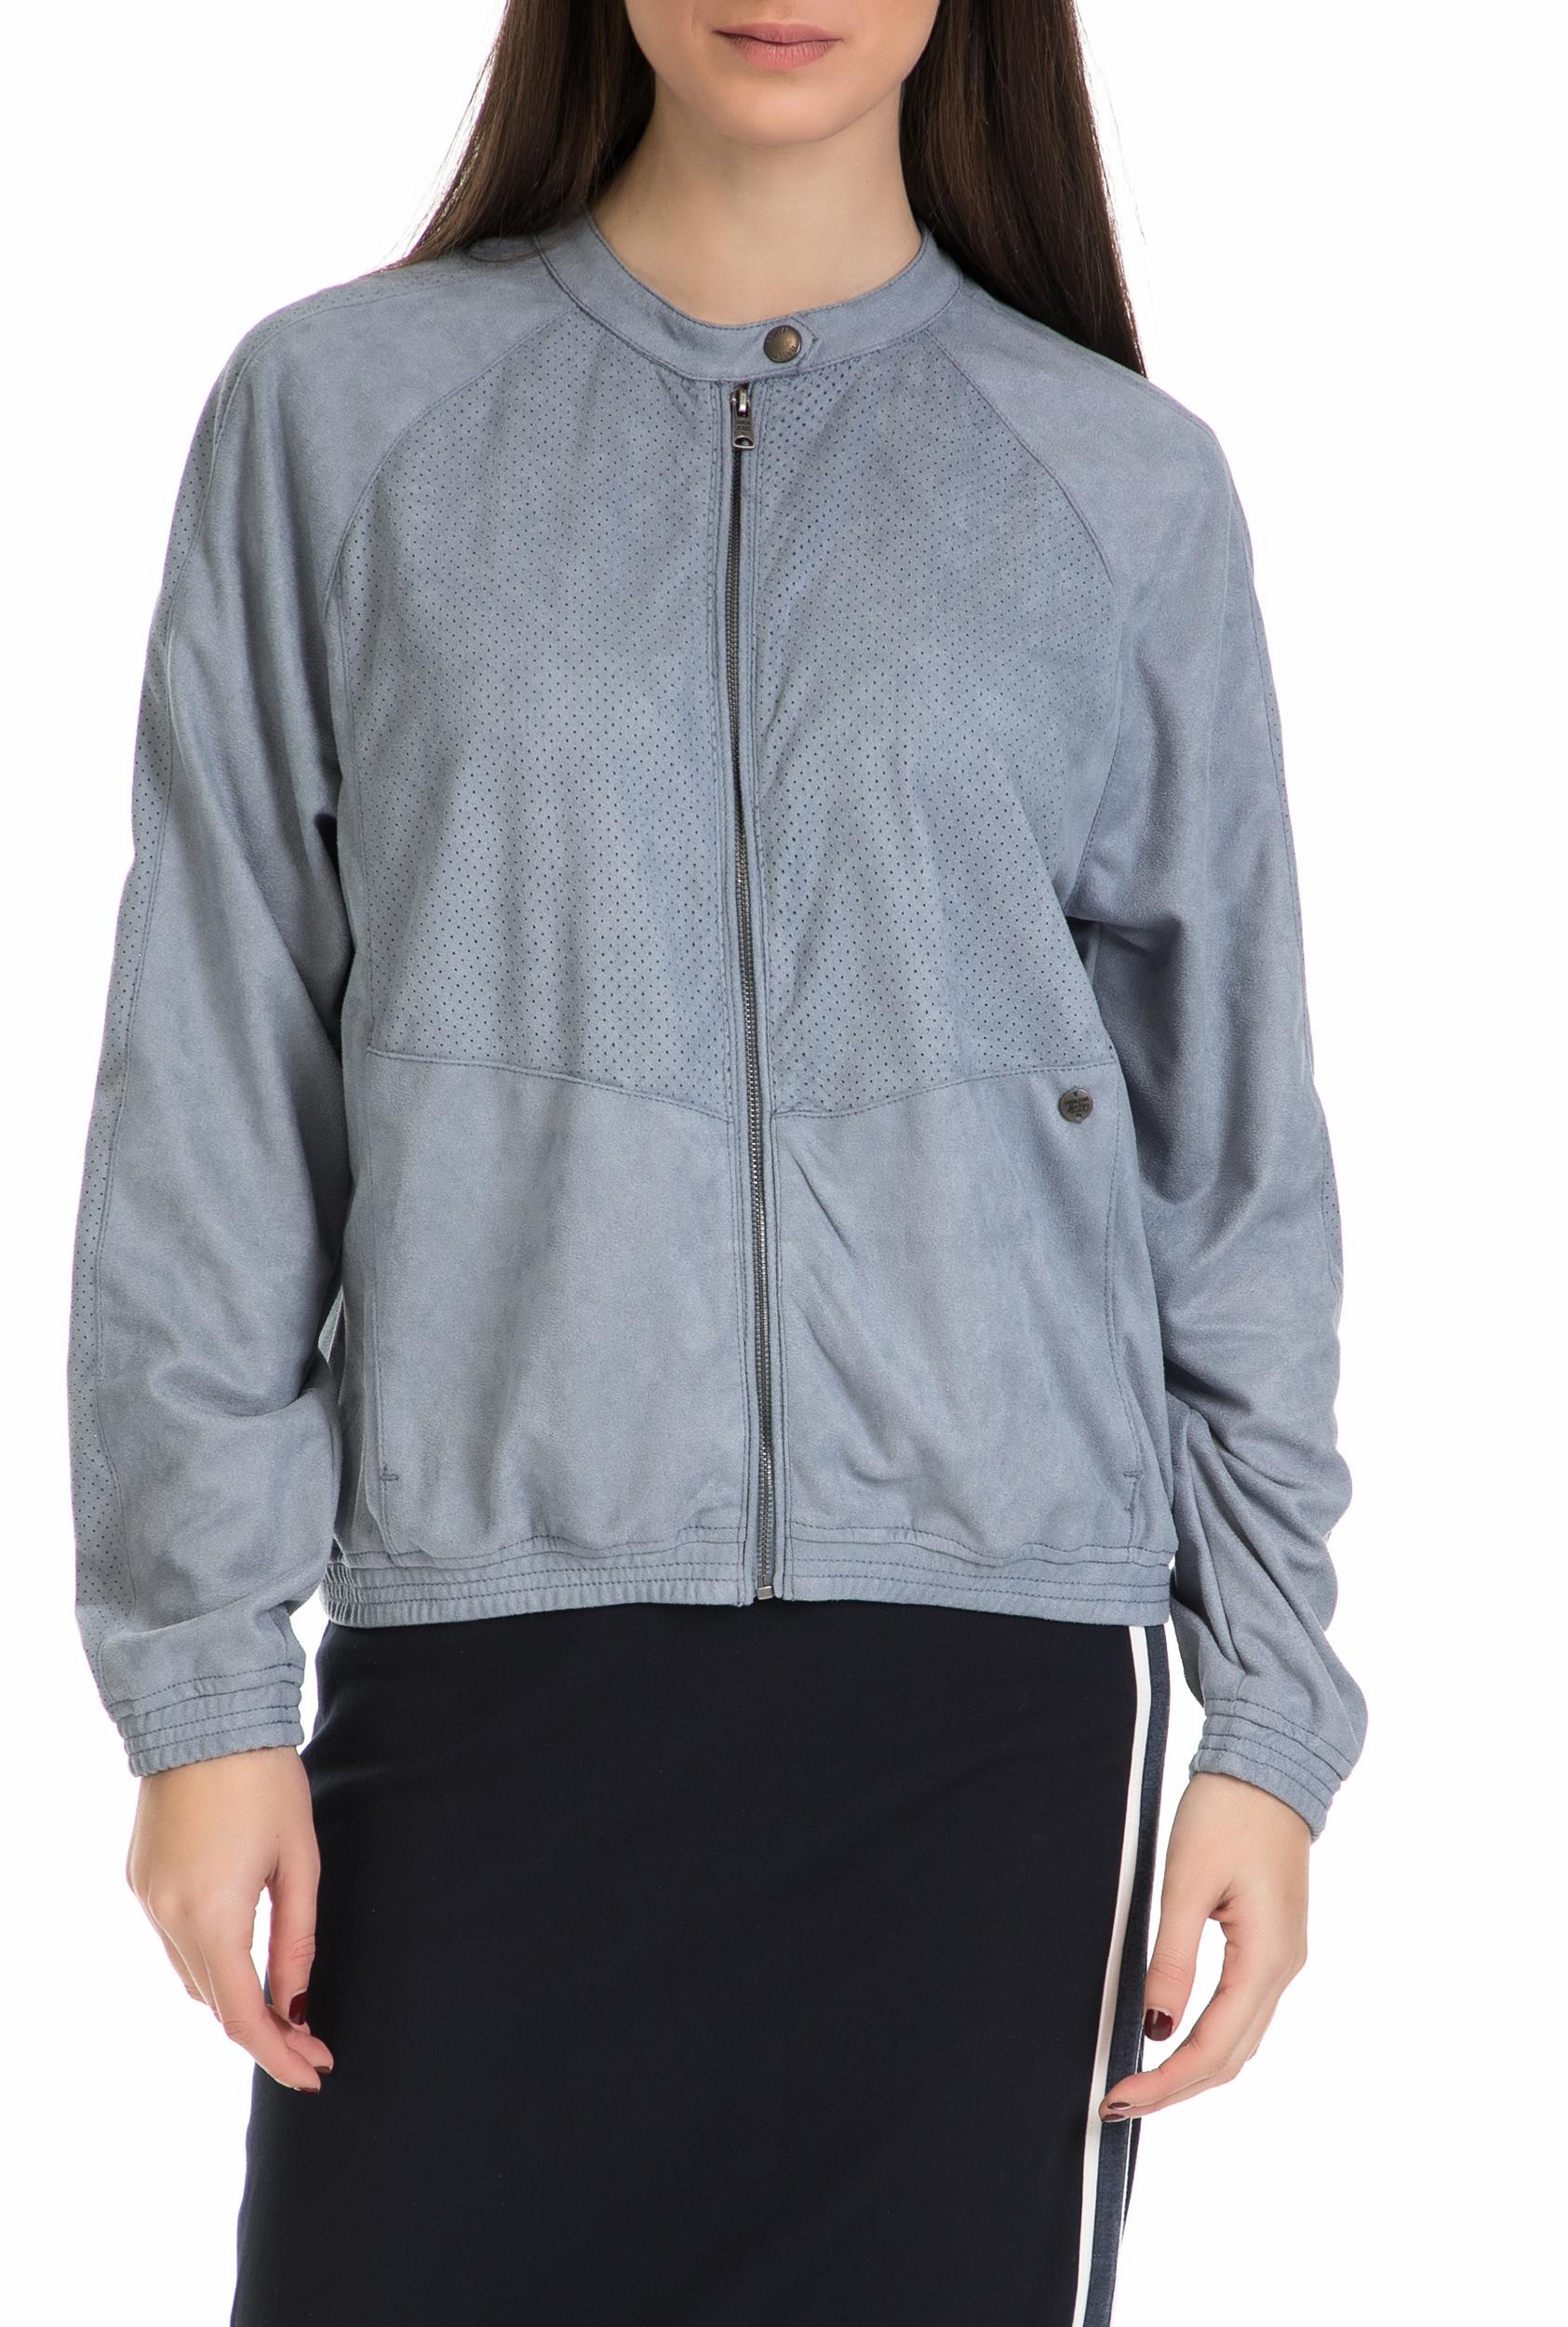 8fc63817f0 CollectiveOnline GARCIA JEANS - Γυναικείο jacket από την Garcia Jeans  γαλάζιο